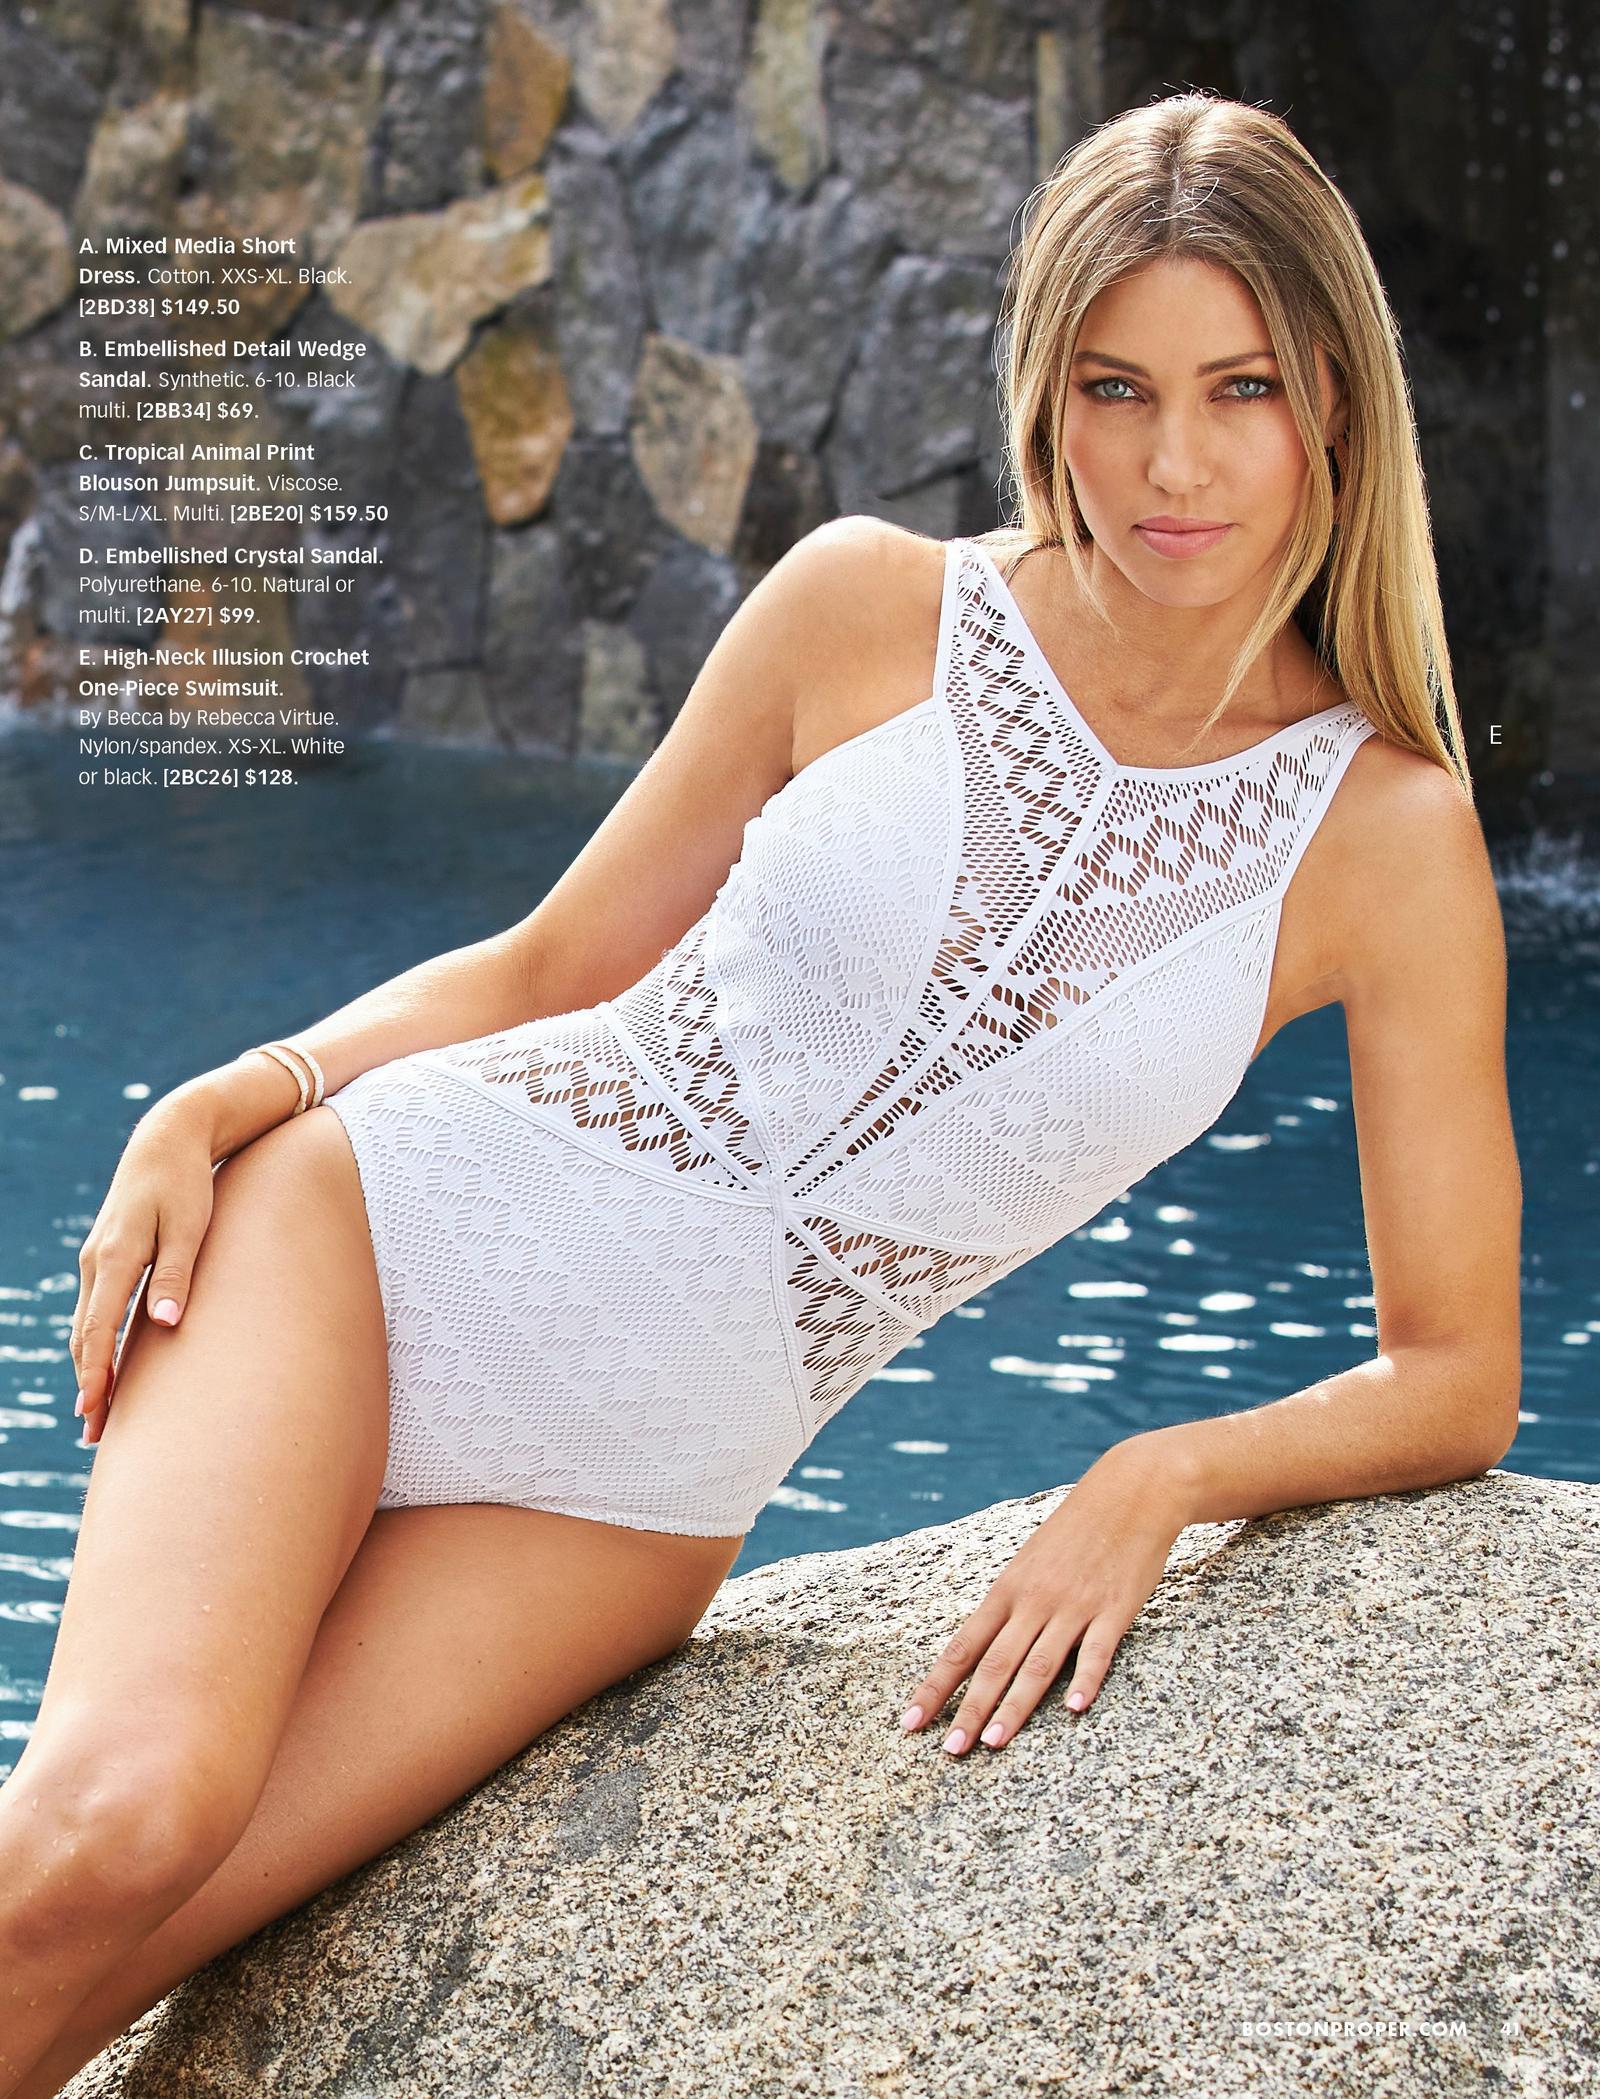 model wearing a white crochet high-neck one-piece swimsuit.